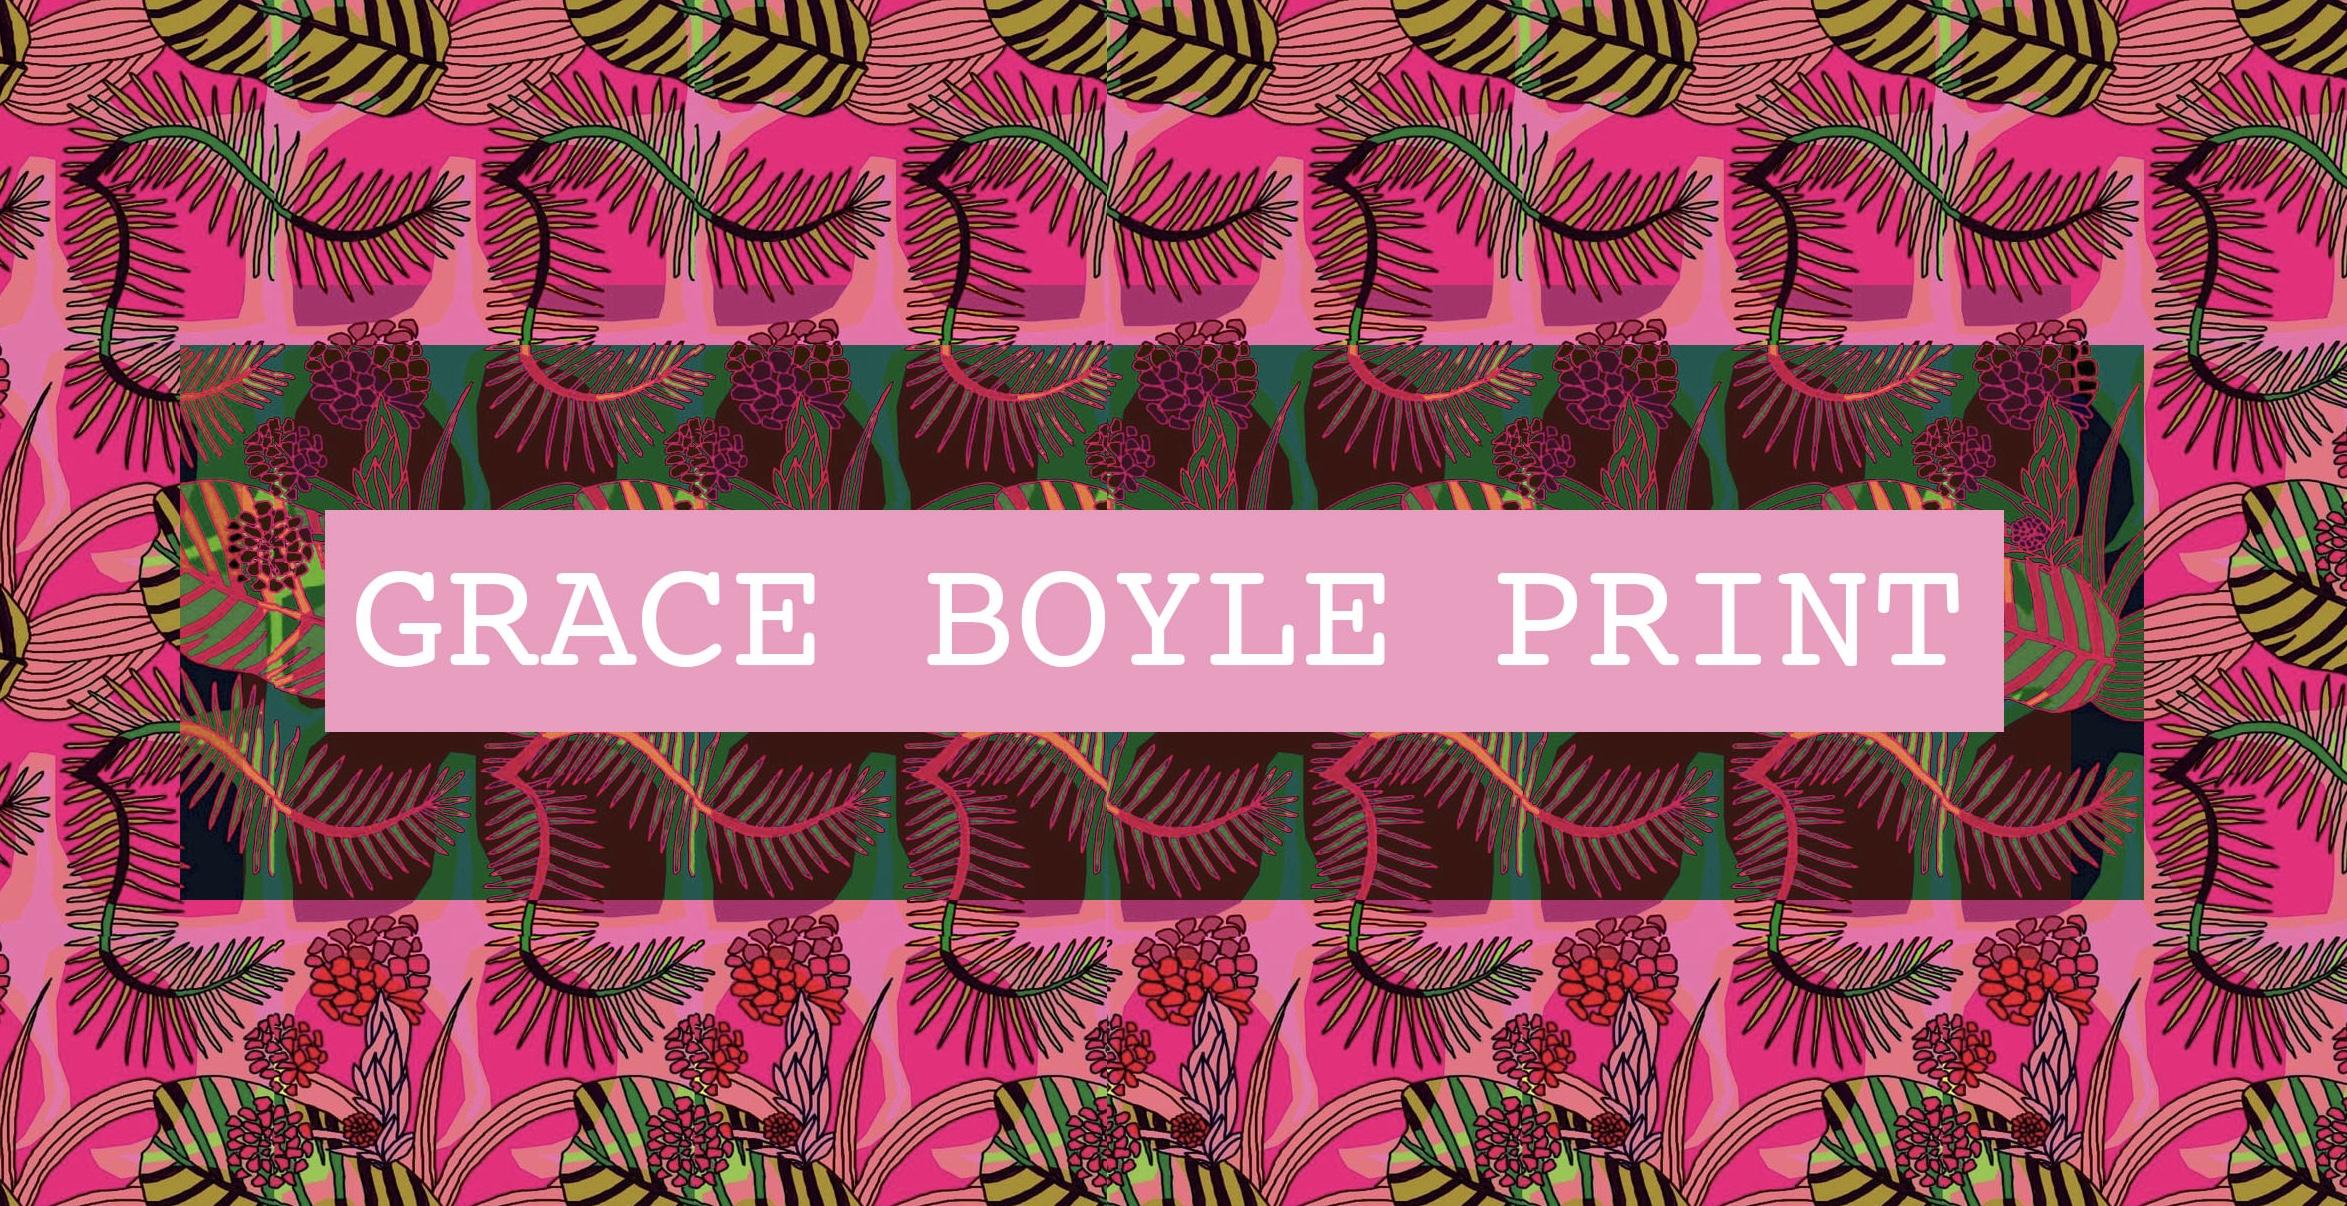 GRACE BOYLE